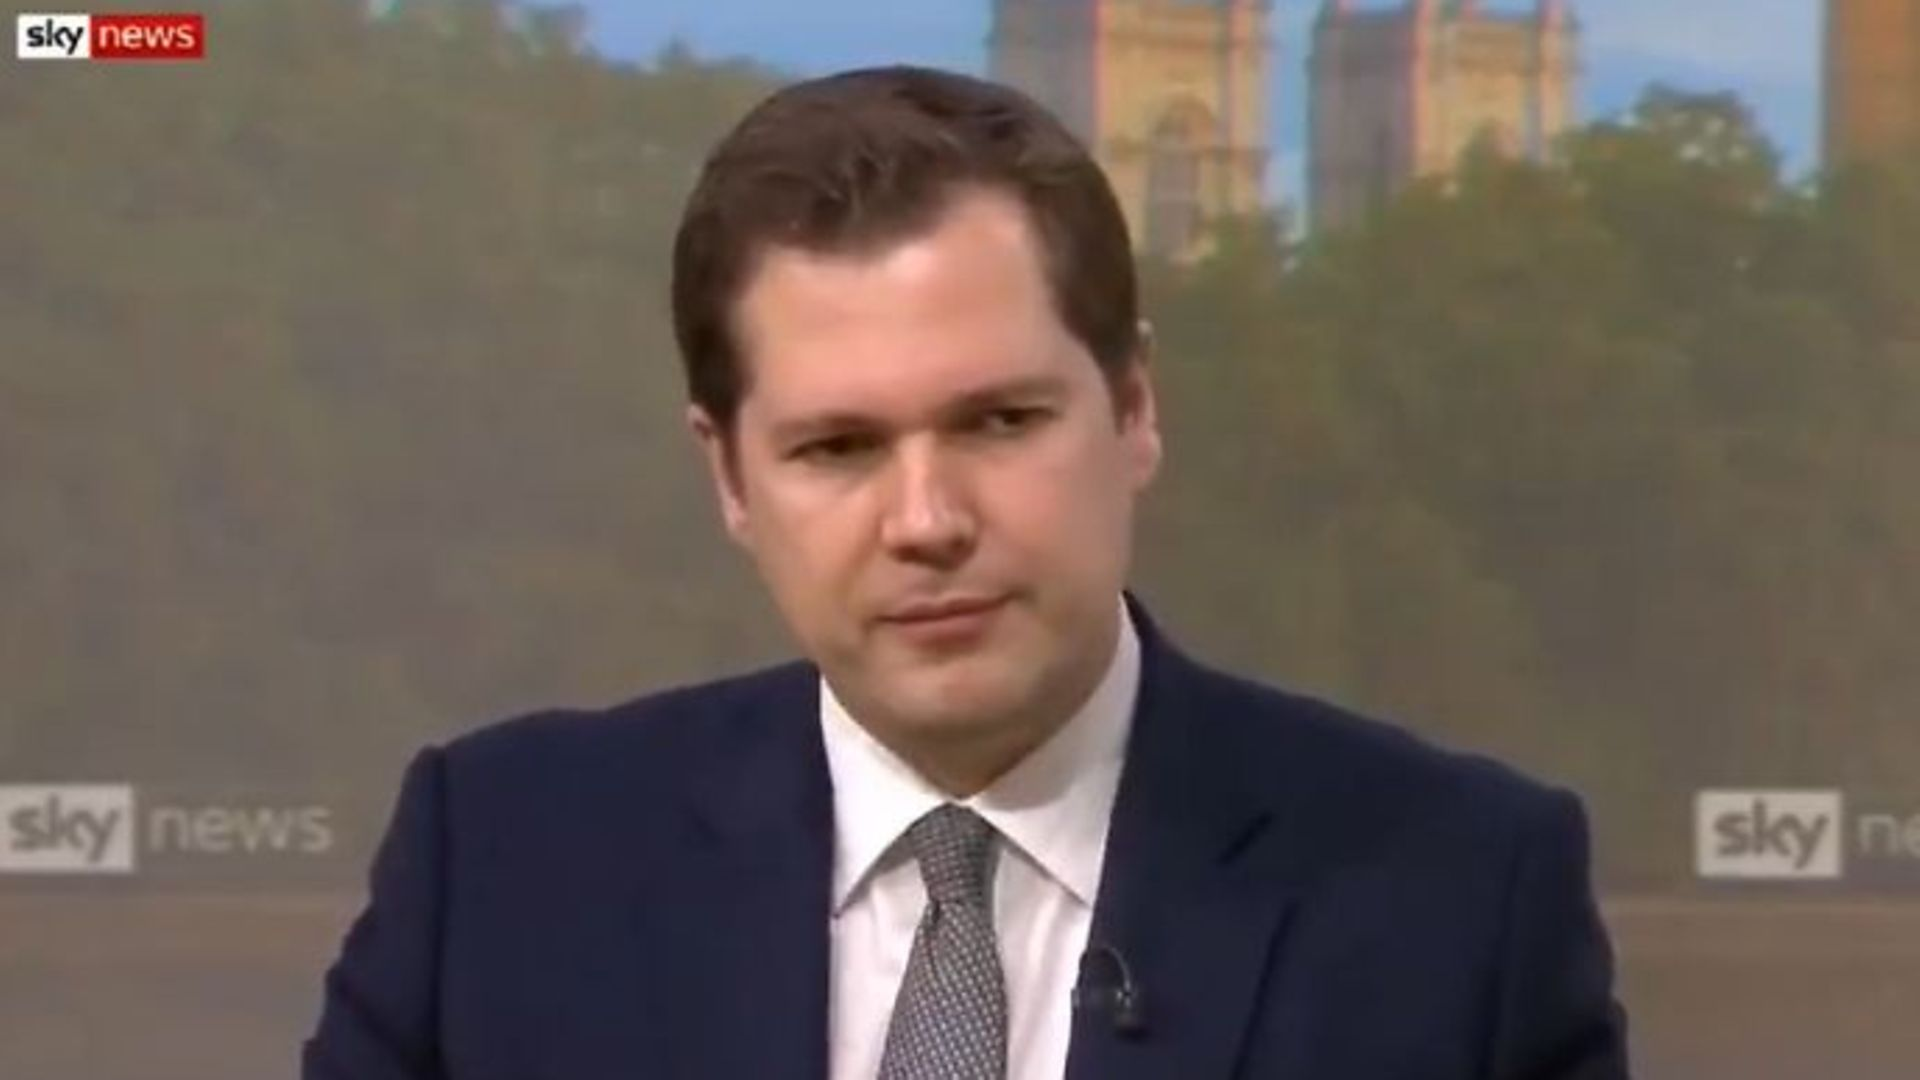 Communities minister Robert Jenrick on Sky News - Credit: Twitter